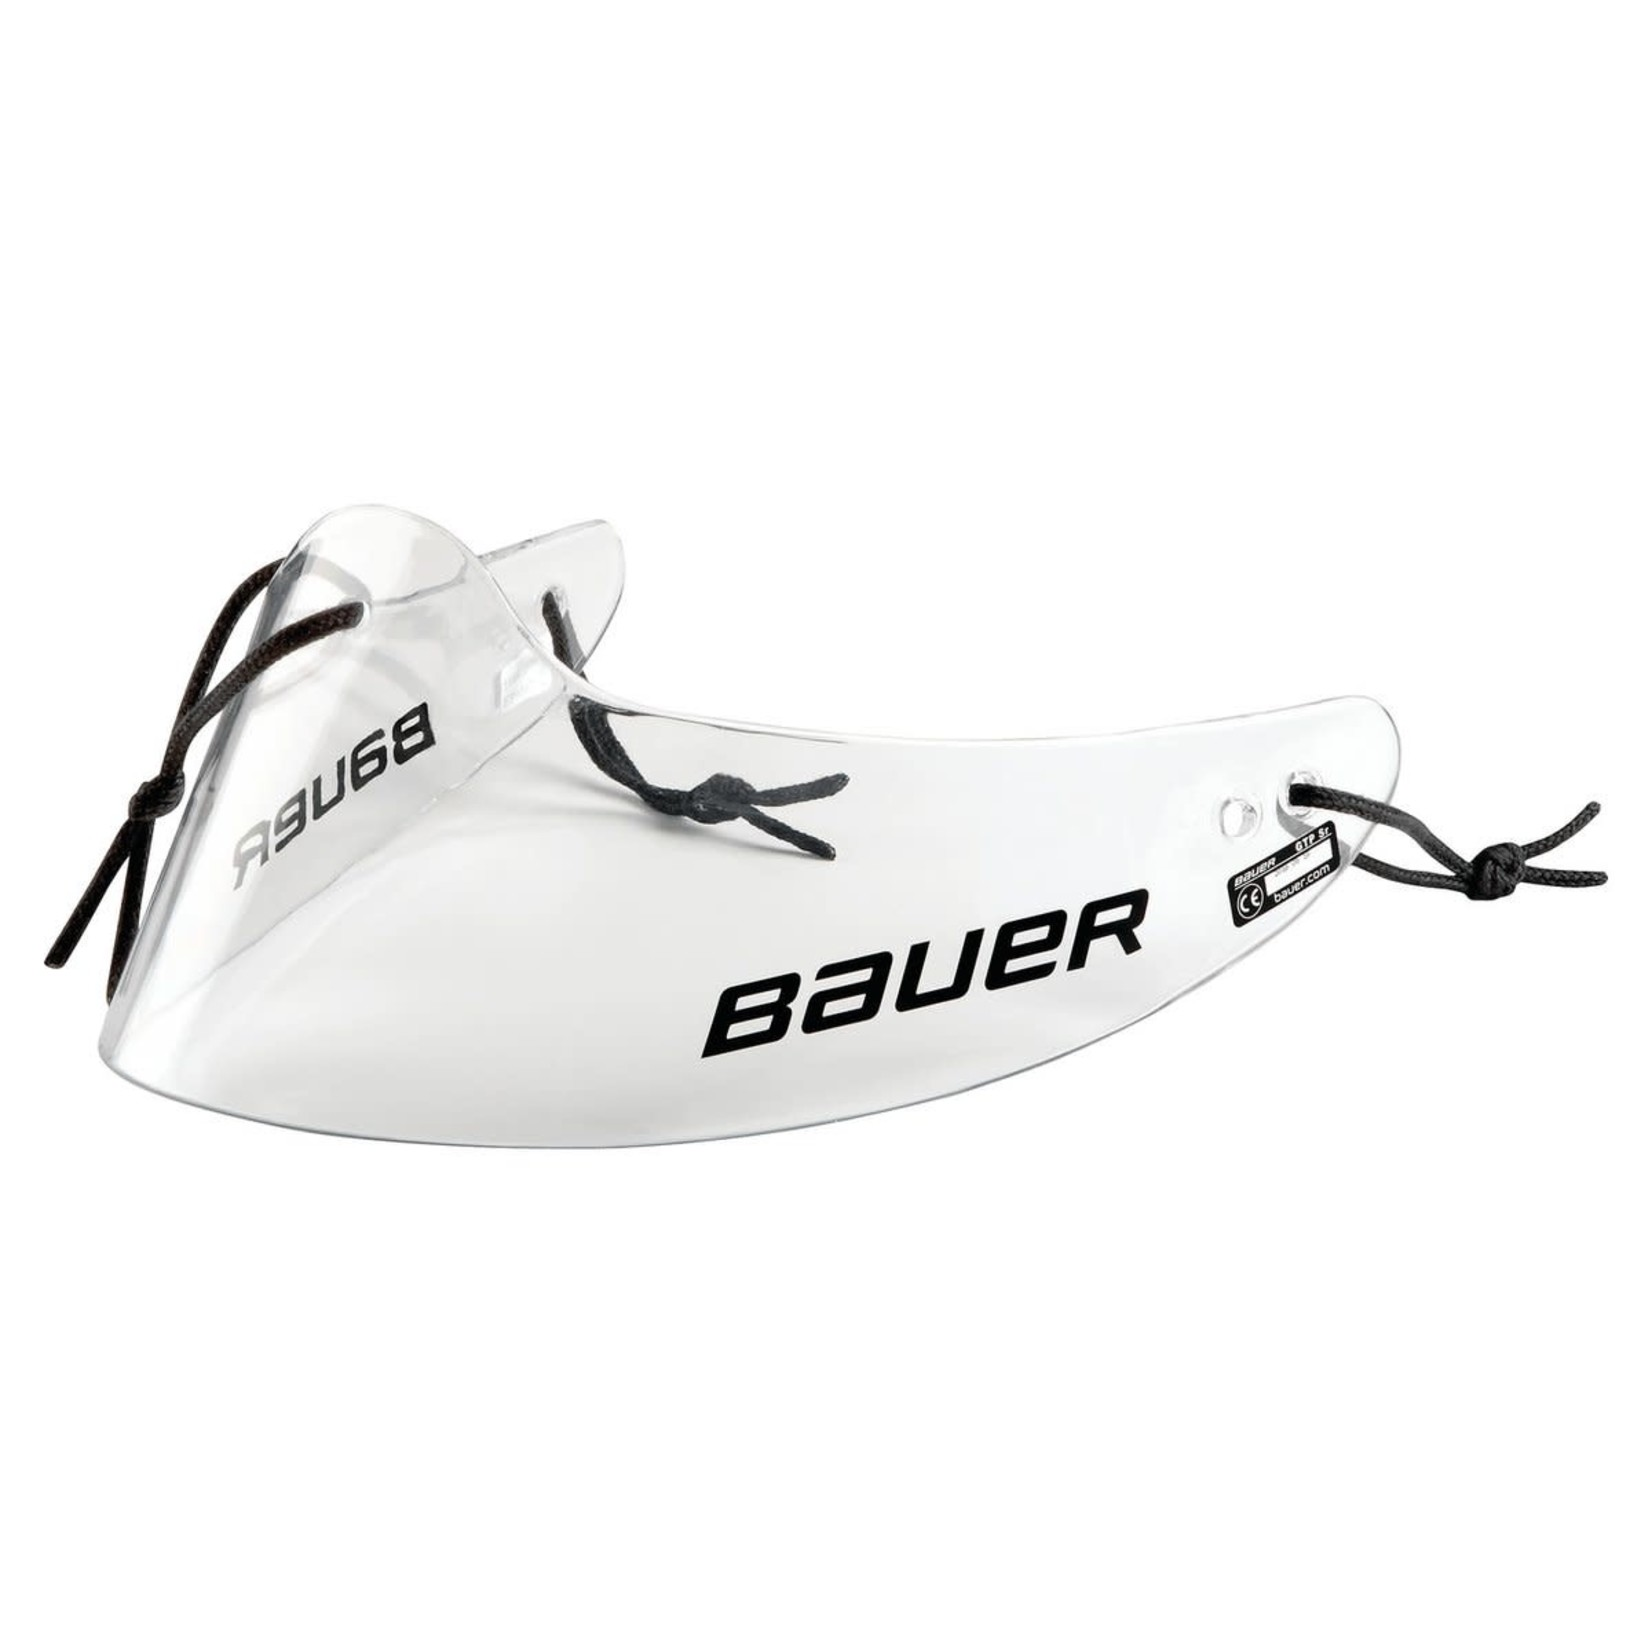 Bauer Bauer Goal Throat Protector, Junior